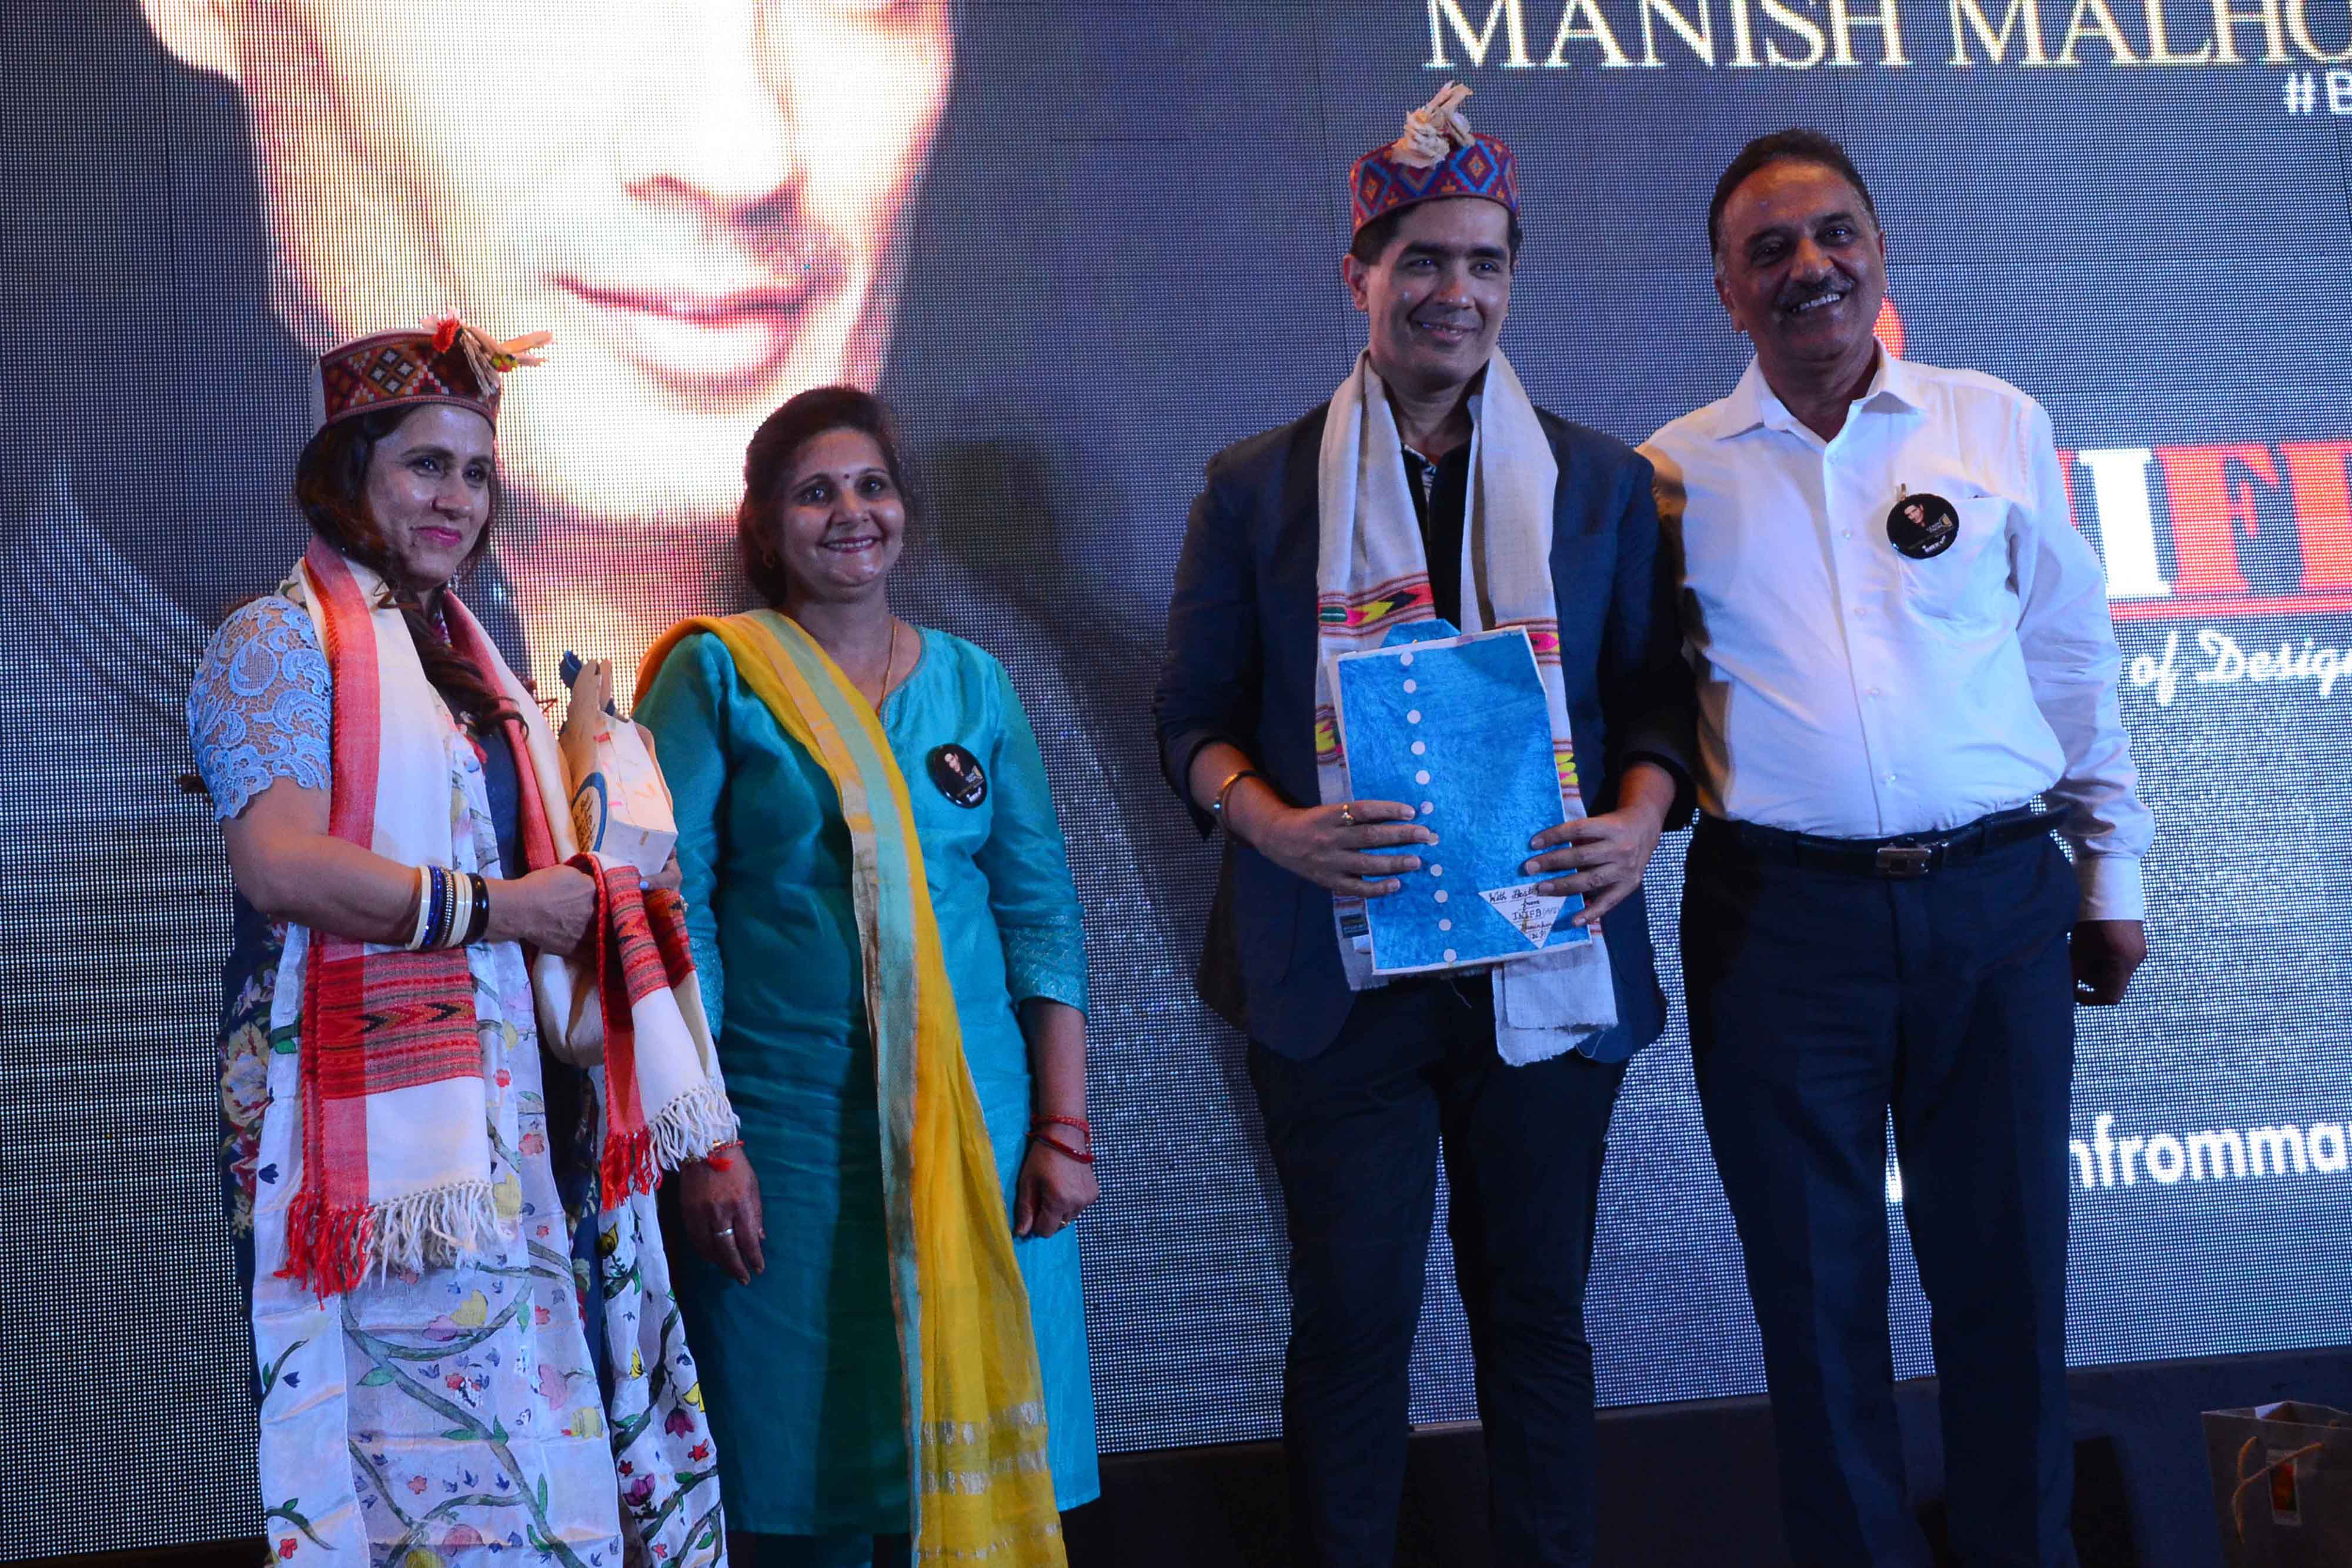 Manish Malhotra at INIFD